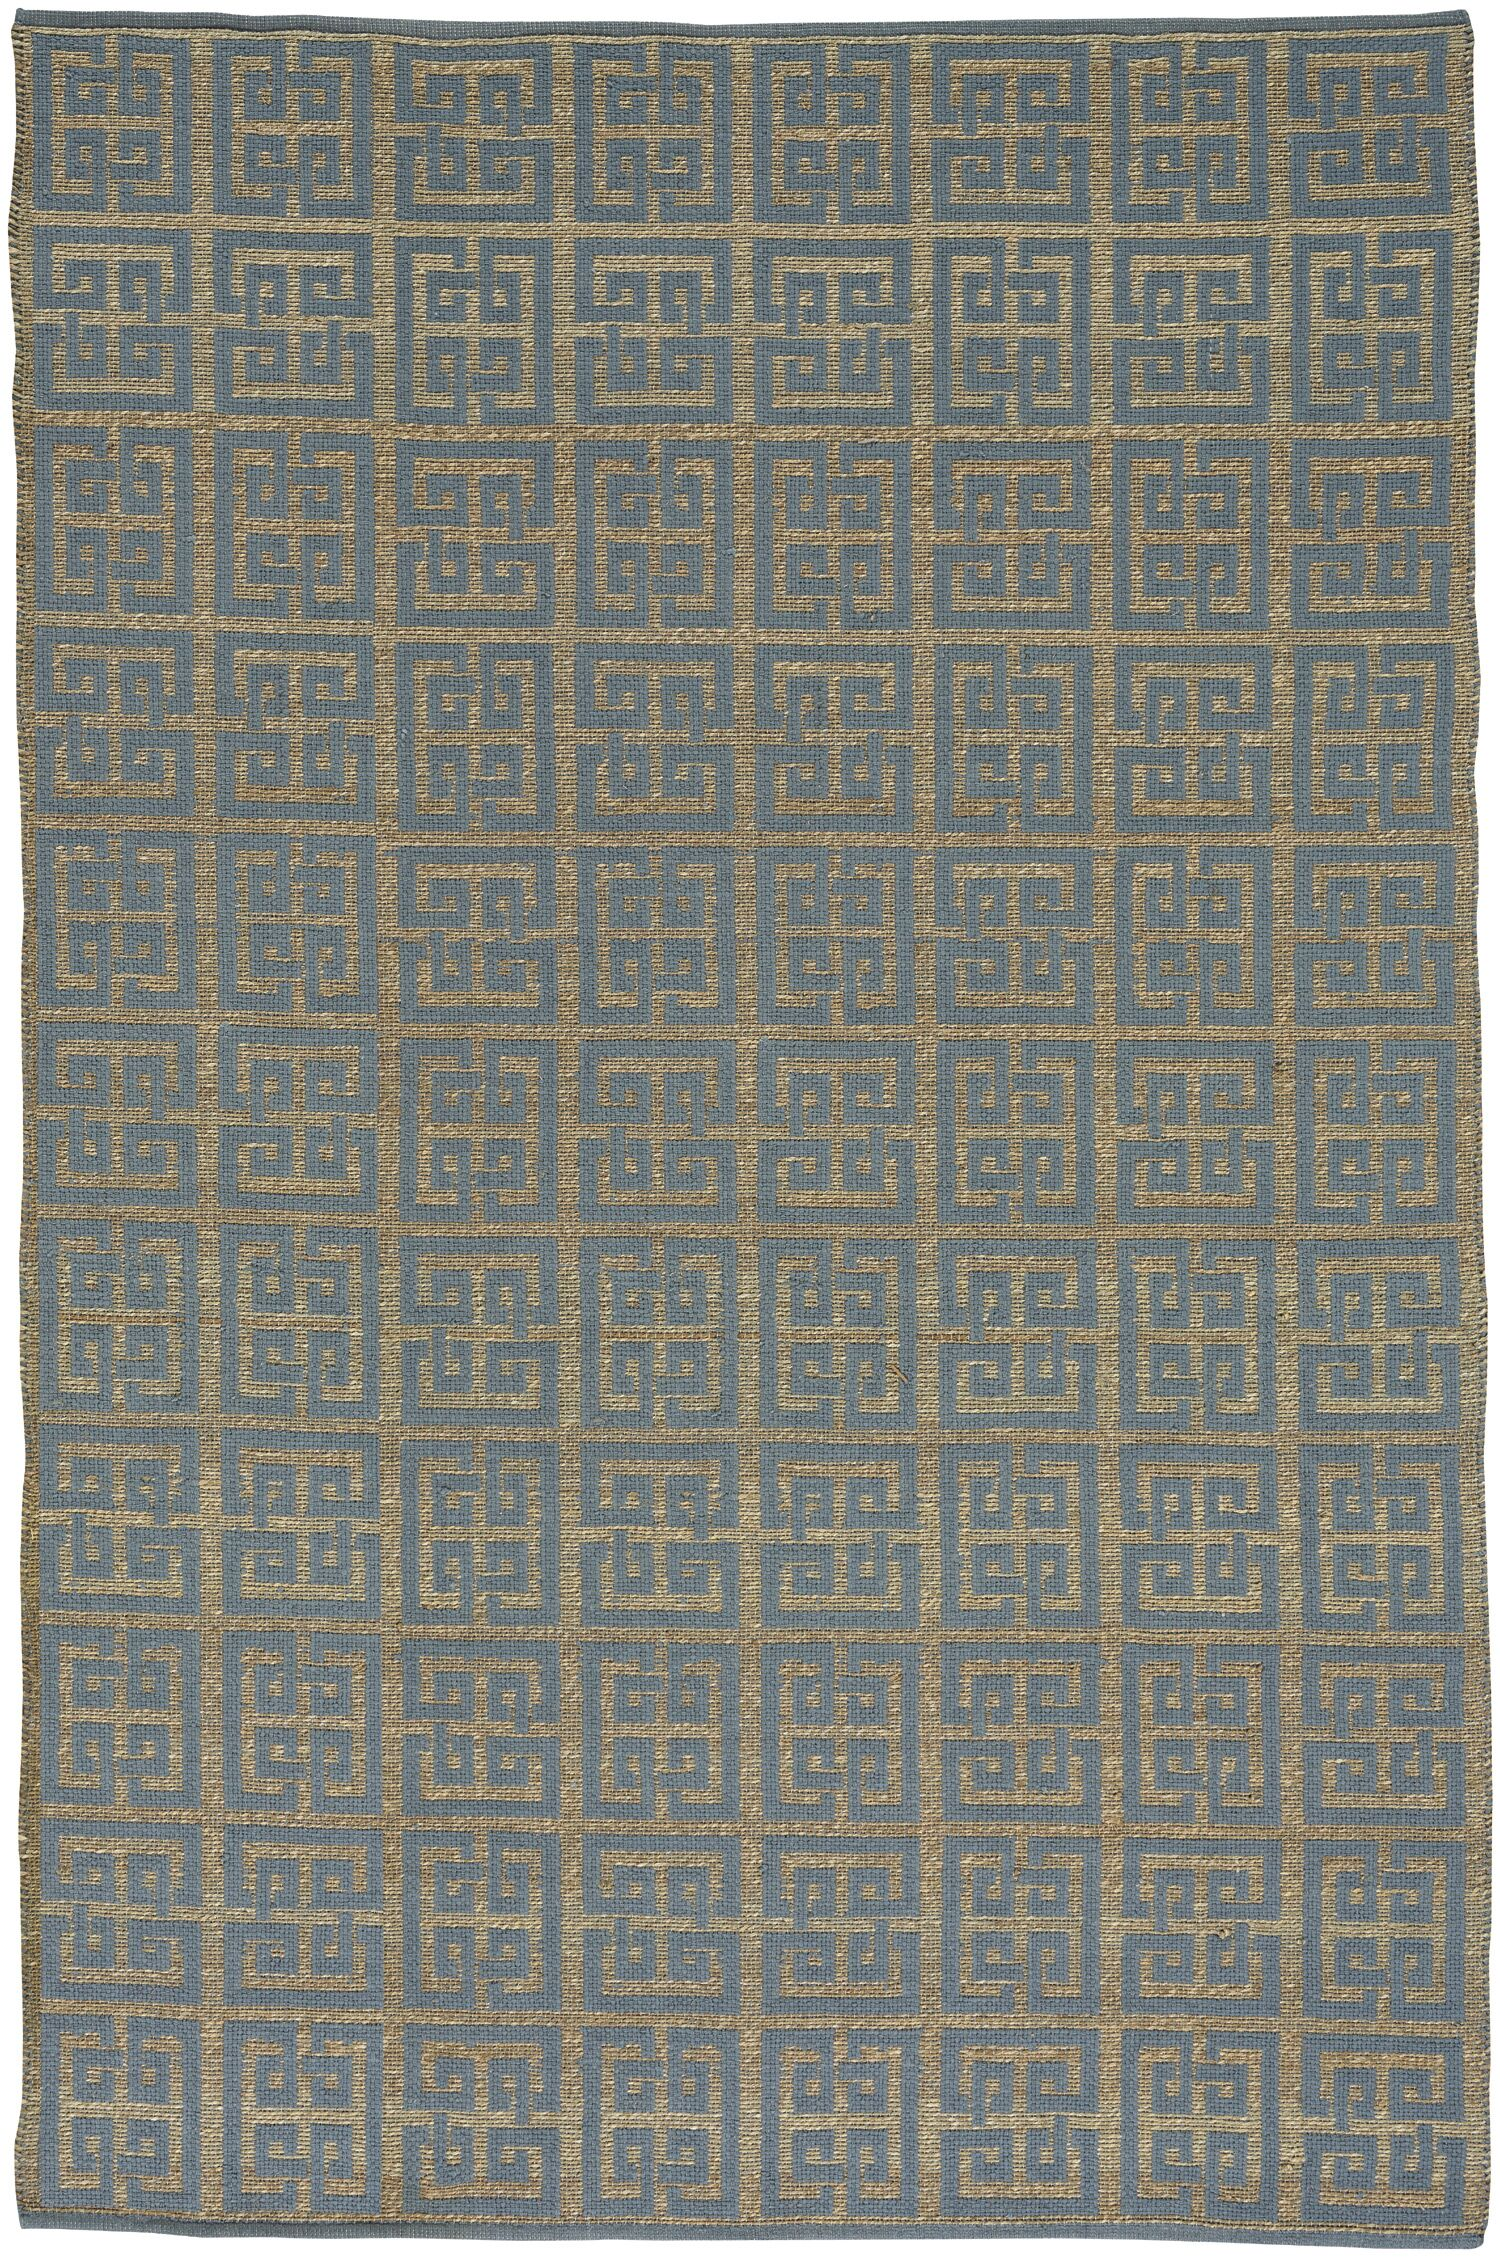 Maci Flat Blue/Brown Area Rug Rug Size: 3' x 5'